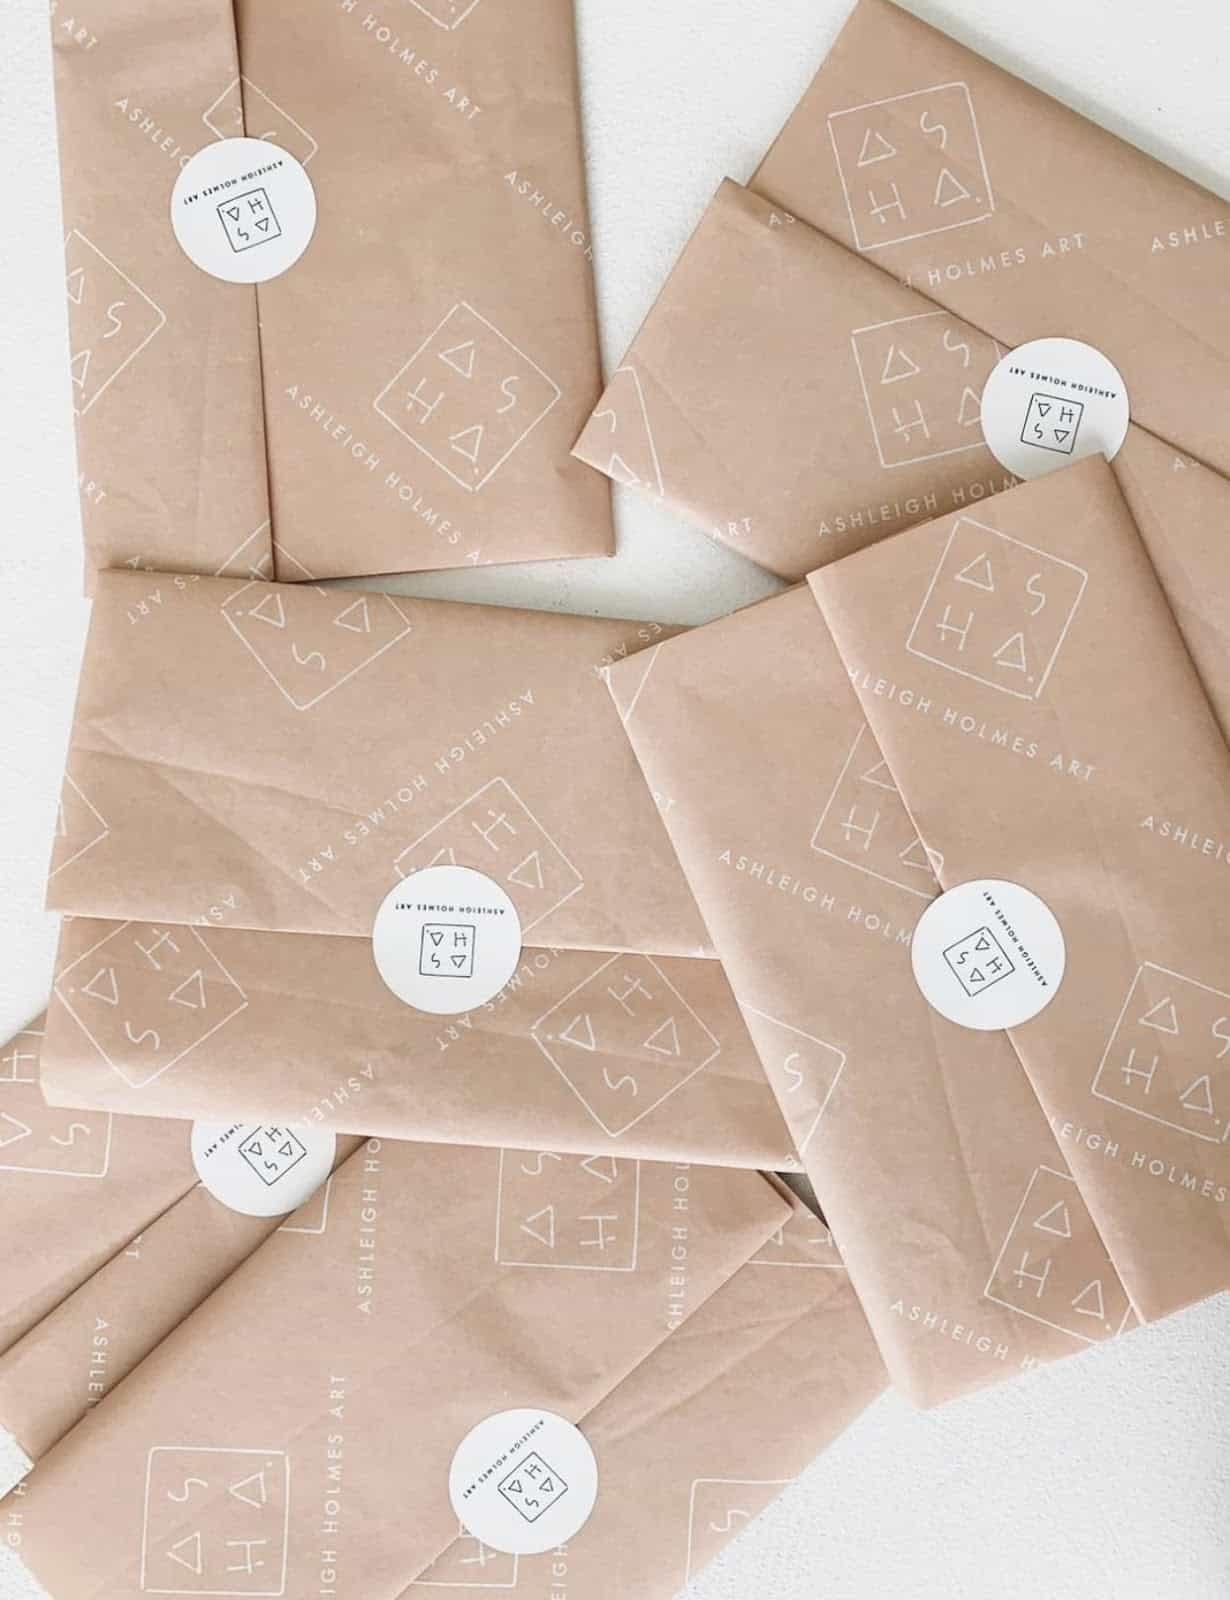 printingnews-A030-03 paperbox好文分享-為什麼起訂量與定制包裝有關